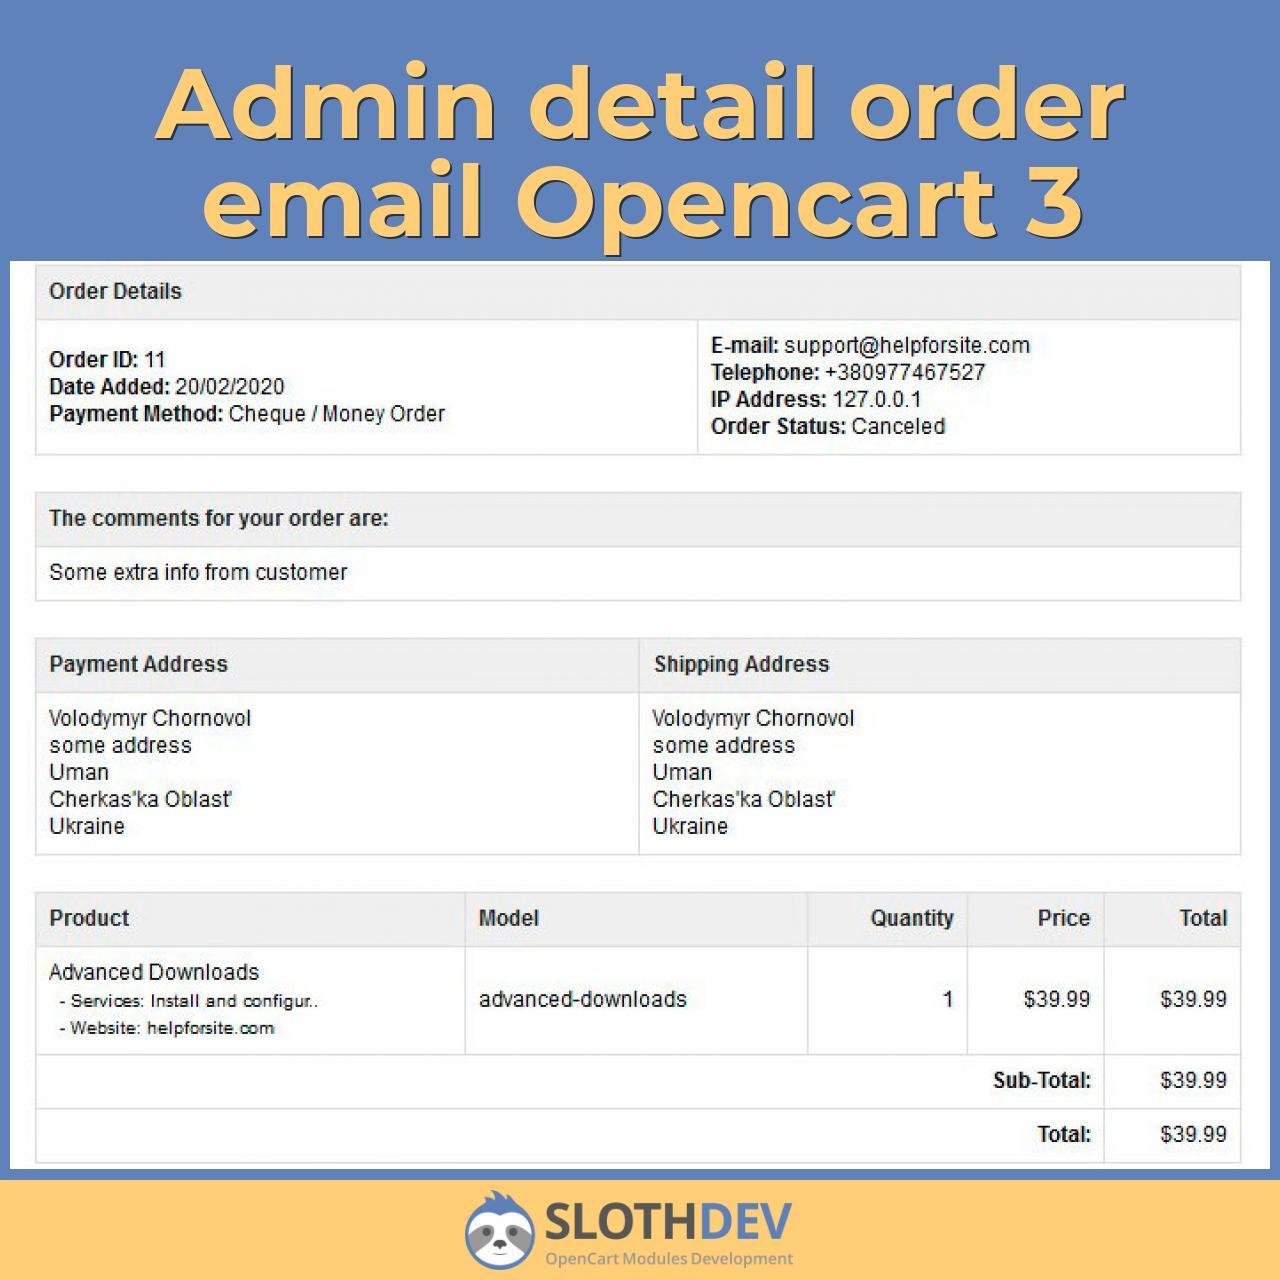 Admin detail order email Opencart 3